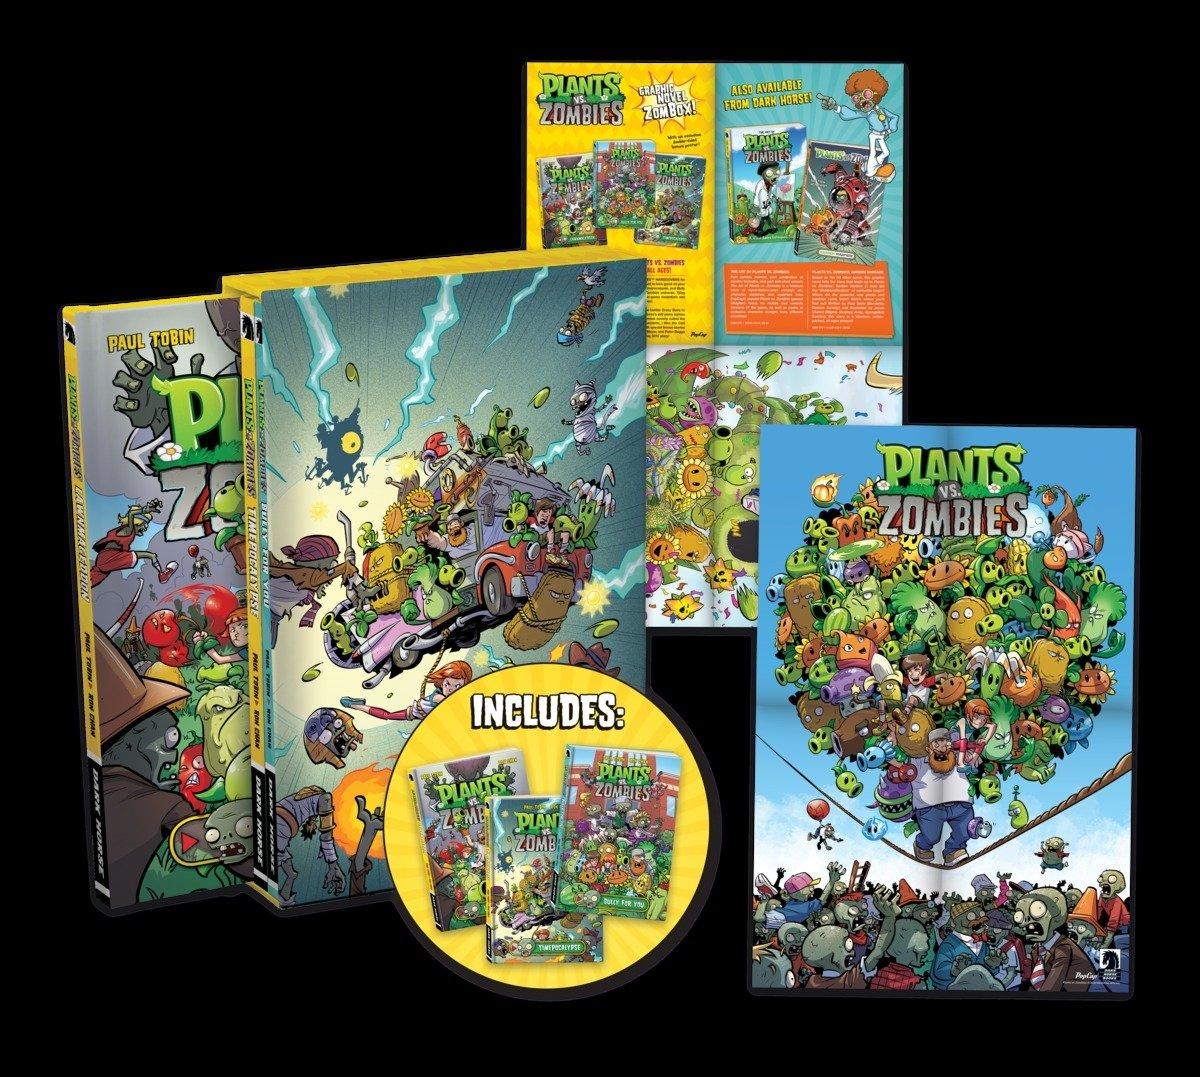 Plants vs. Zombies Boxed Set